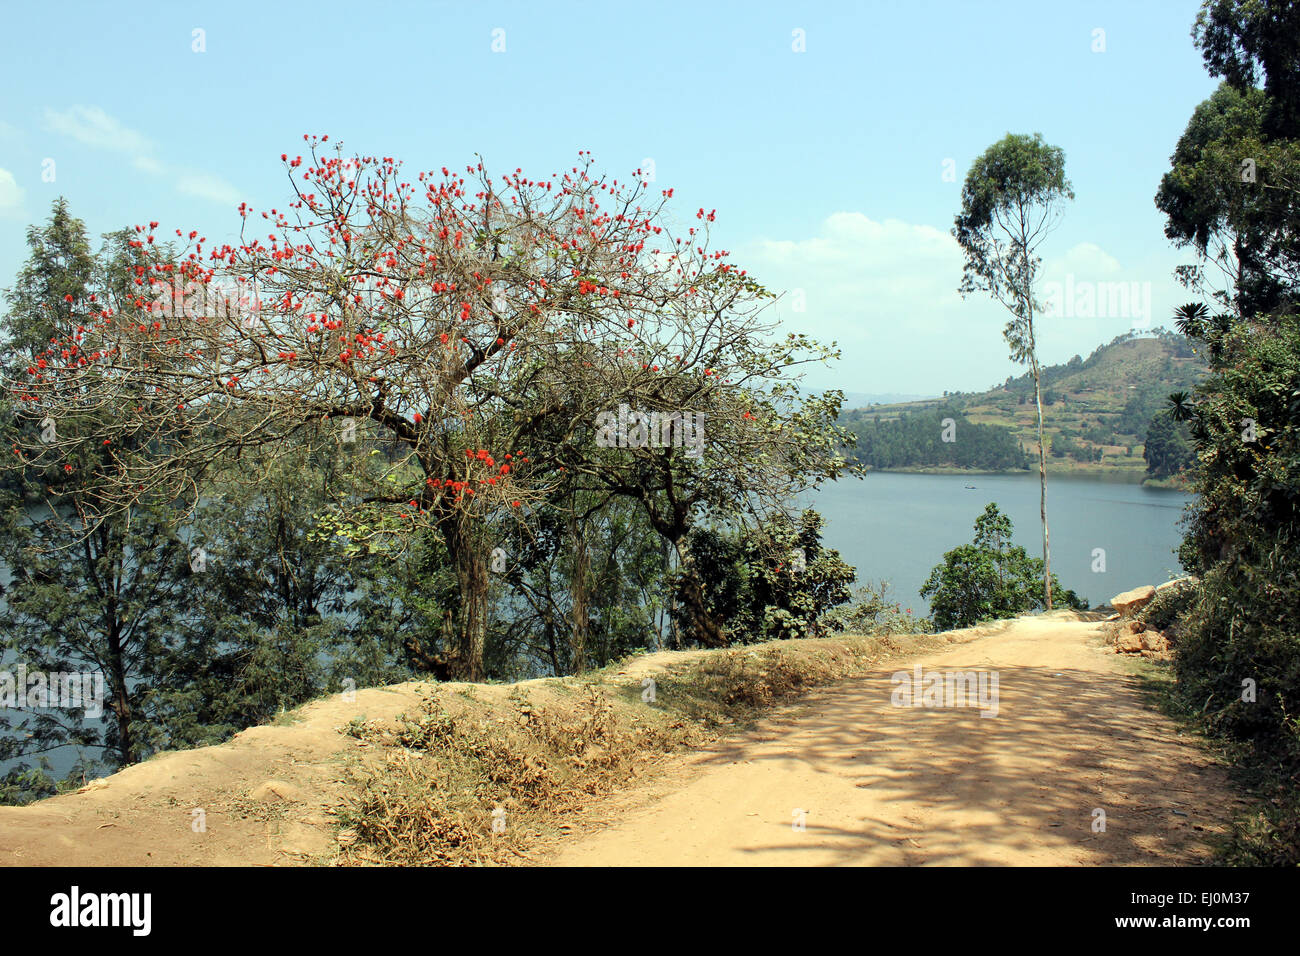 A road skirts Lake Bunyonyi in western Uganda - Stock Image